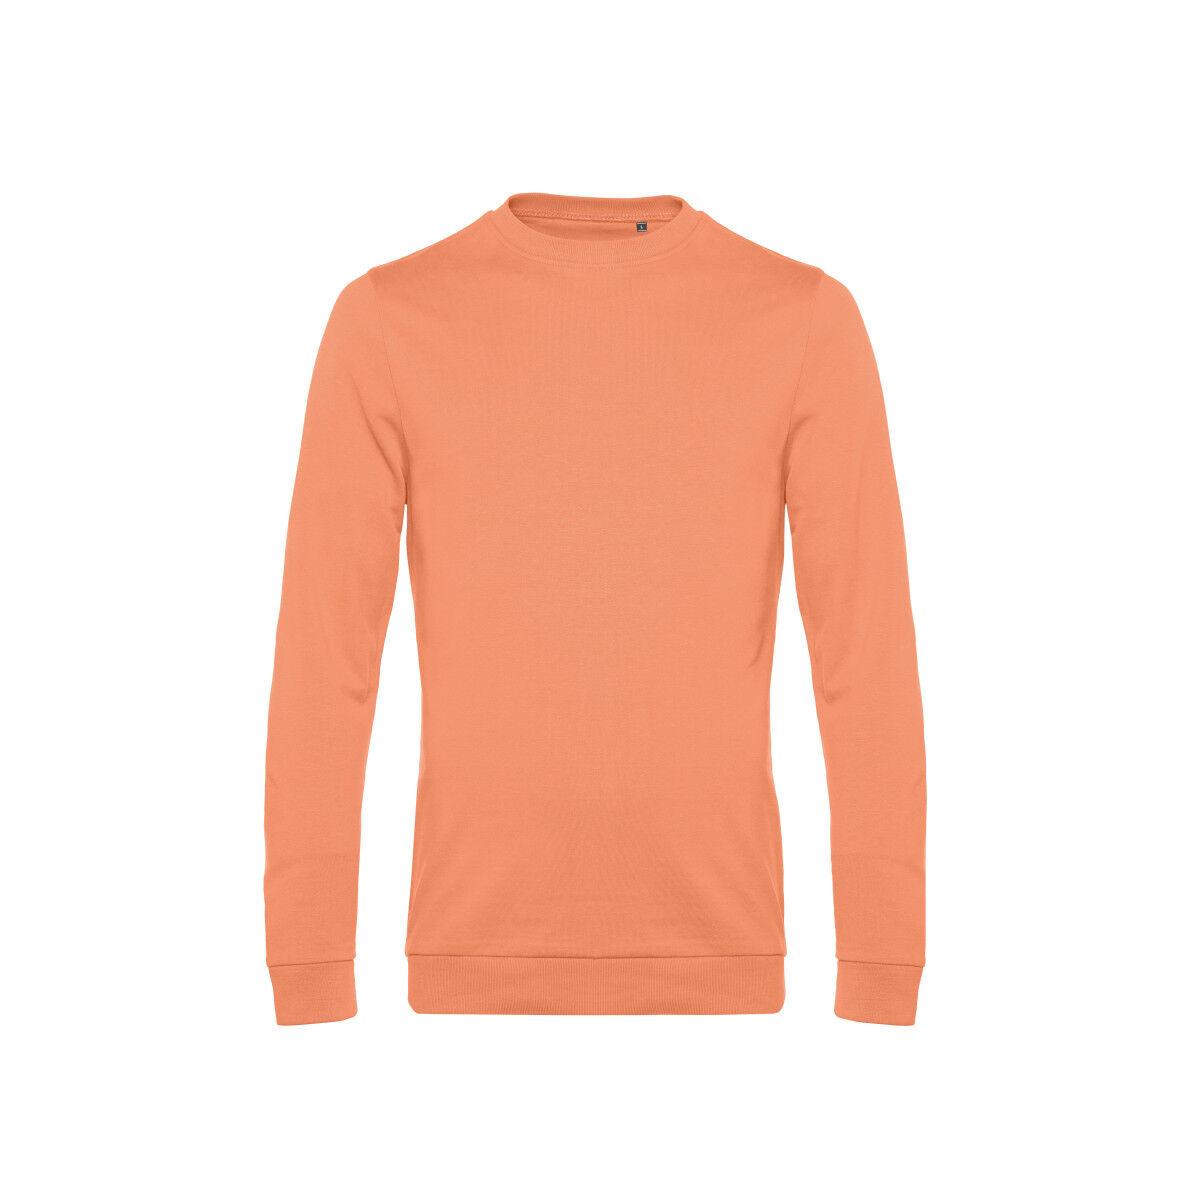 B&C Mens Set In Sweatshirt Melon Orange